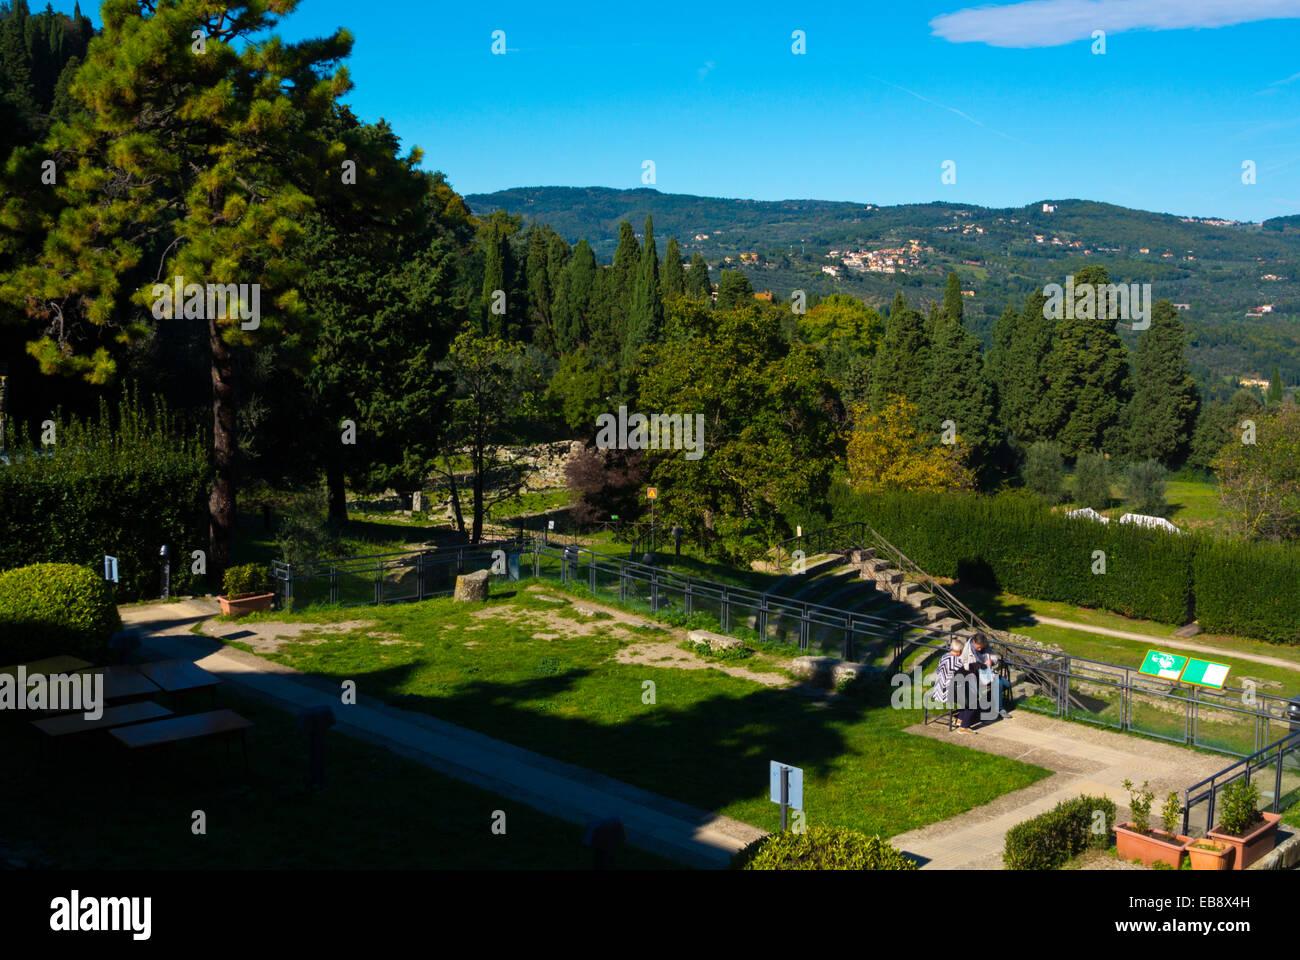 Area Archeologica, Fiesole, near Florence, Tuscany, Italy - Stock Image